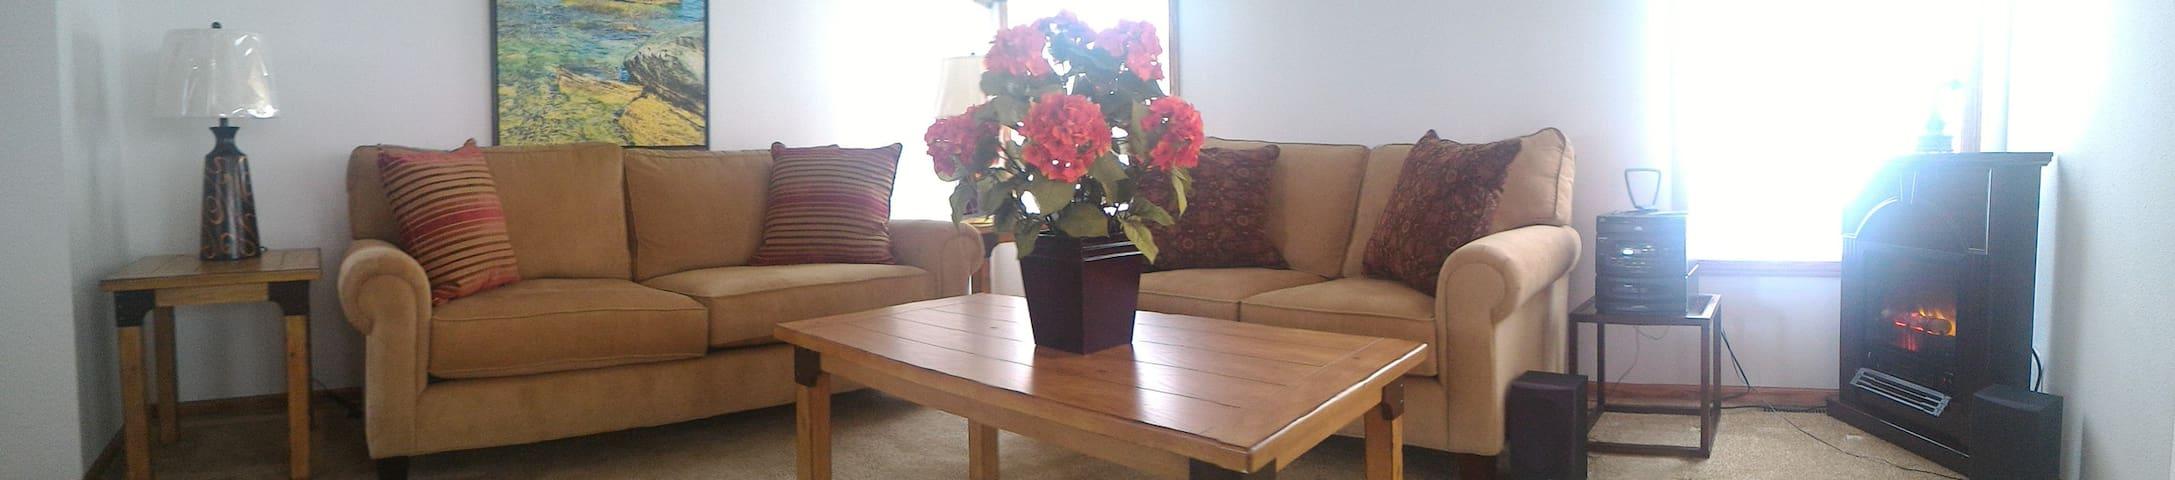 Joelle Room in Guardian Home